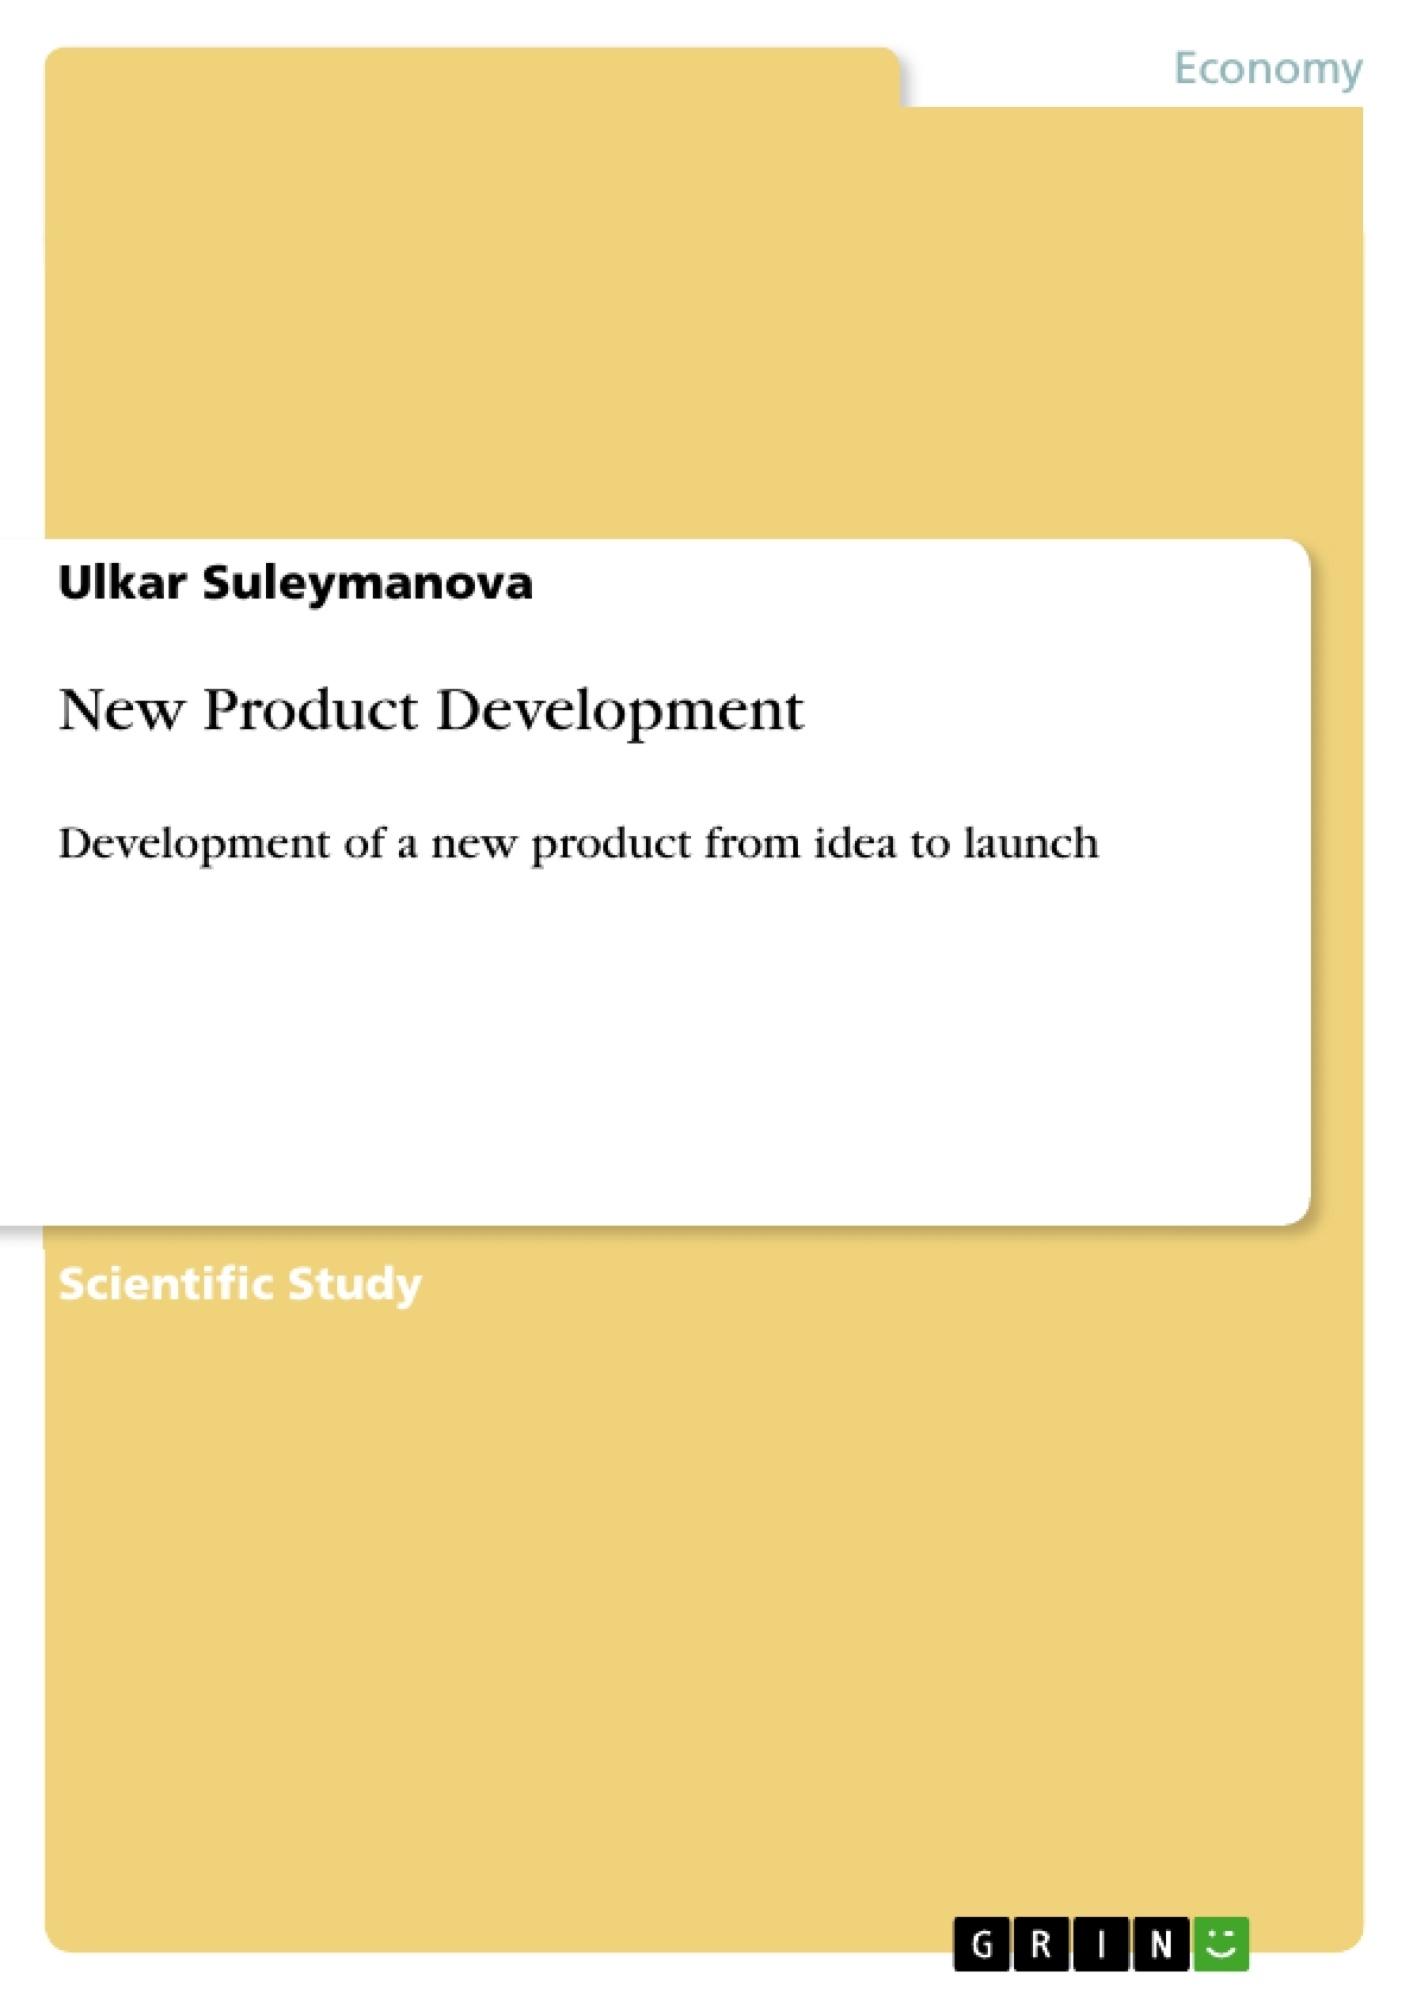 Title: New Product Development